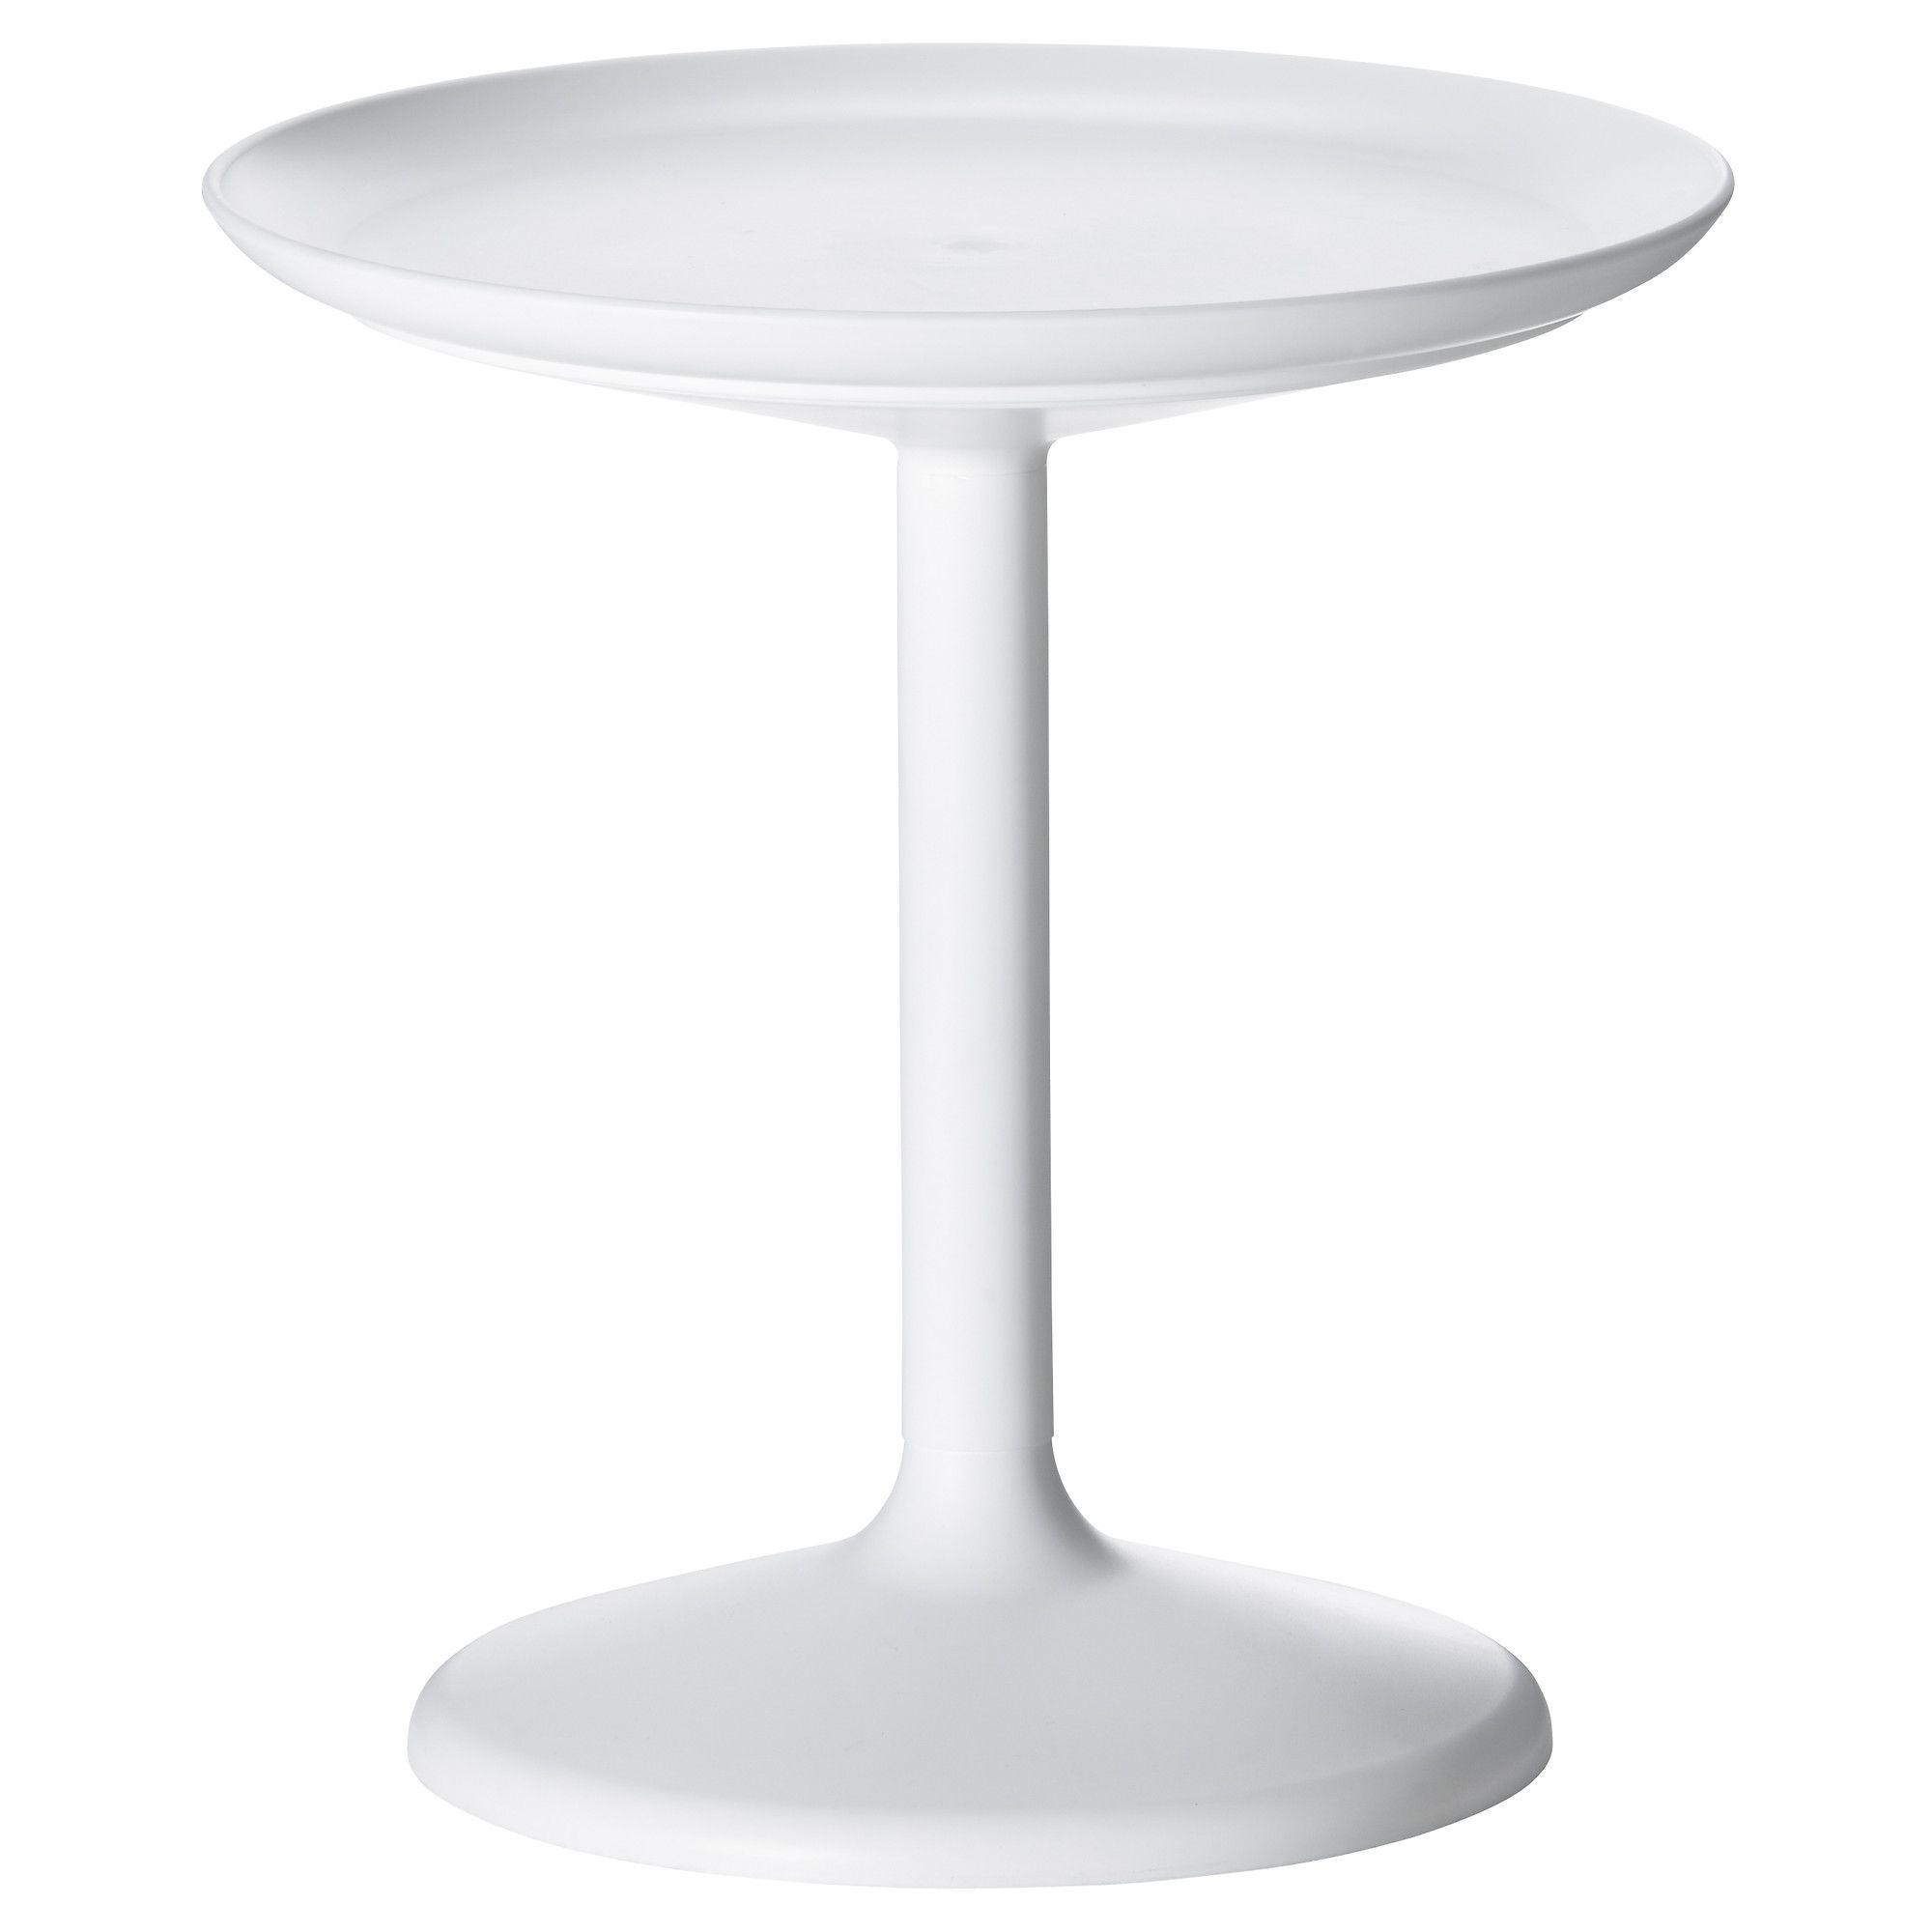 Ikea Ps SandskÄr Tray Table White